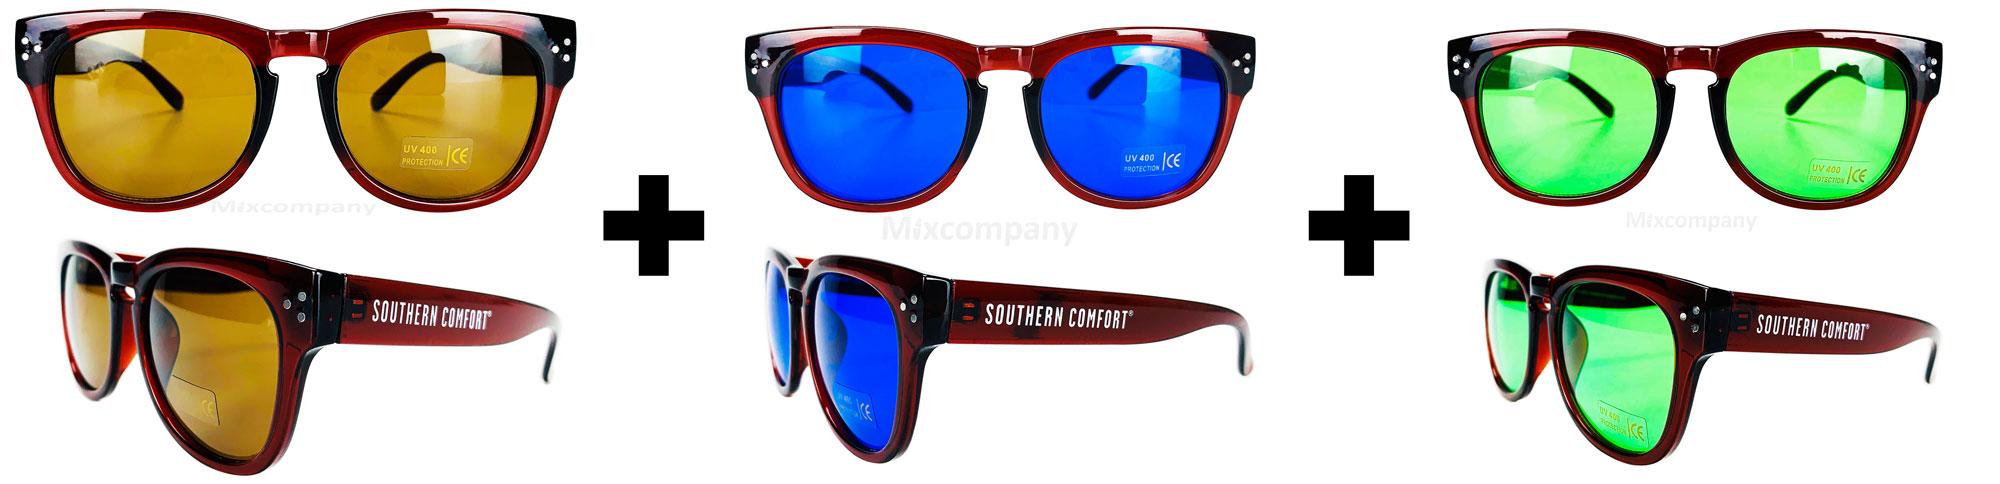 Southern Comfort Nerd Sonnenbrille braun+blau+grün UV400 Unisex - 3er Set Retro Vintage Style Party Festival Bar